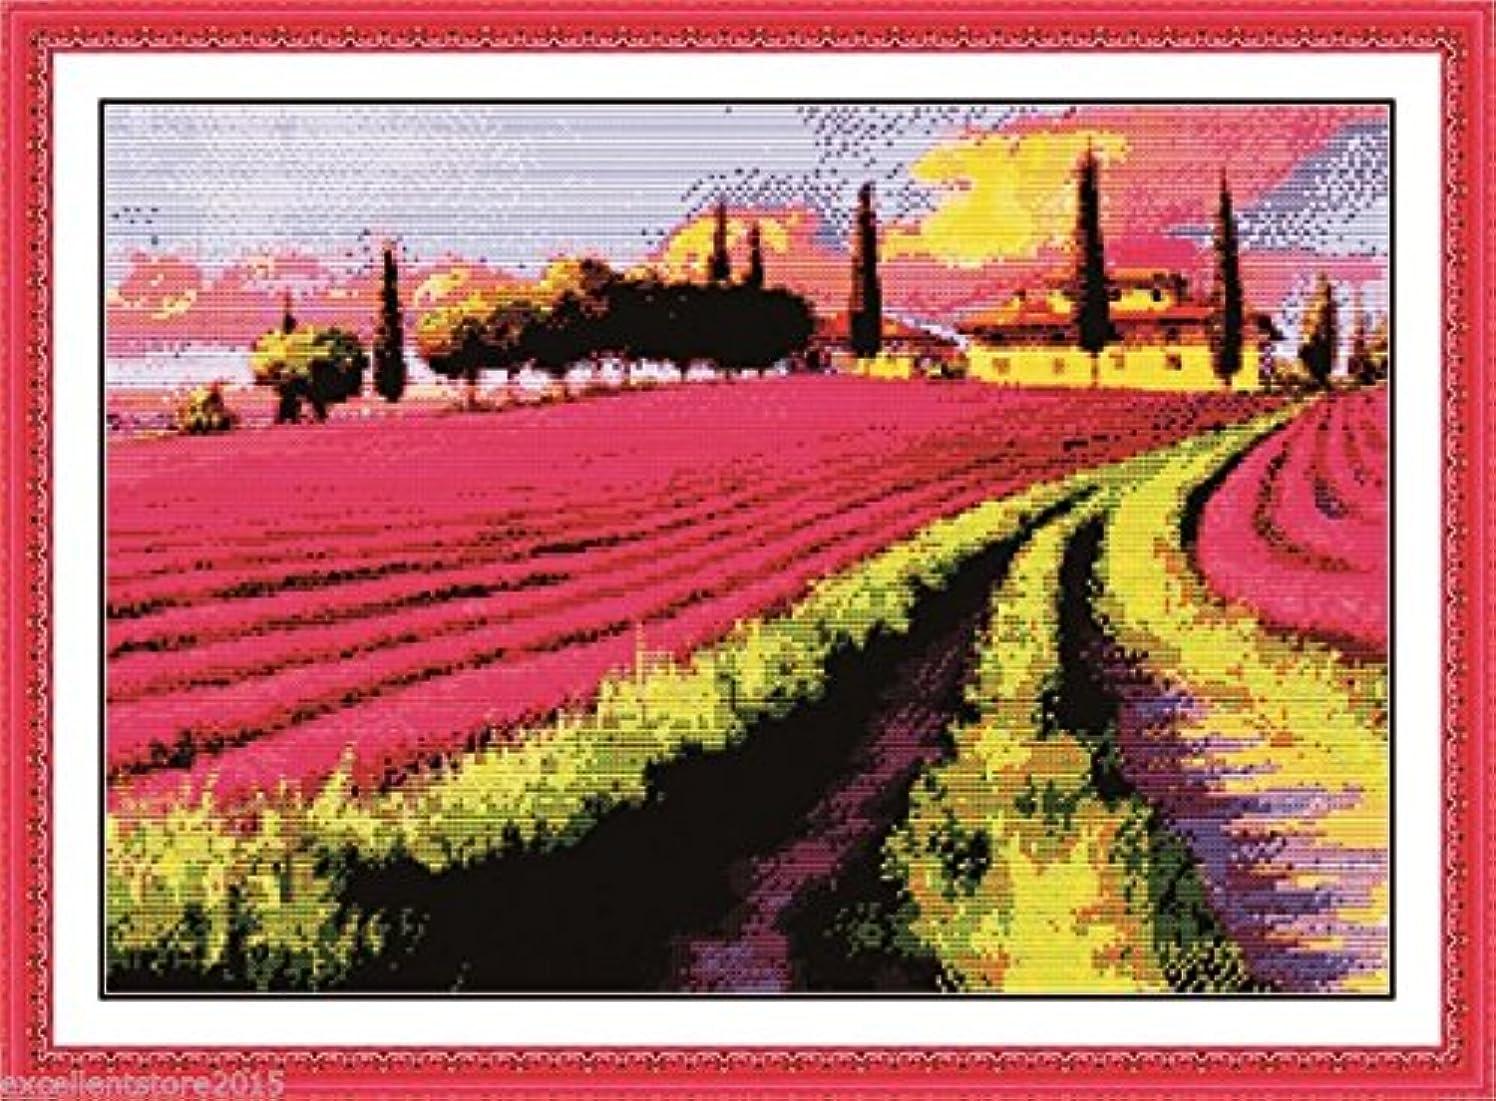 Lavender garden Embroidery Kit Precise Printed Needlework Cross stitch